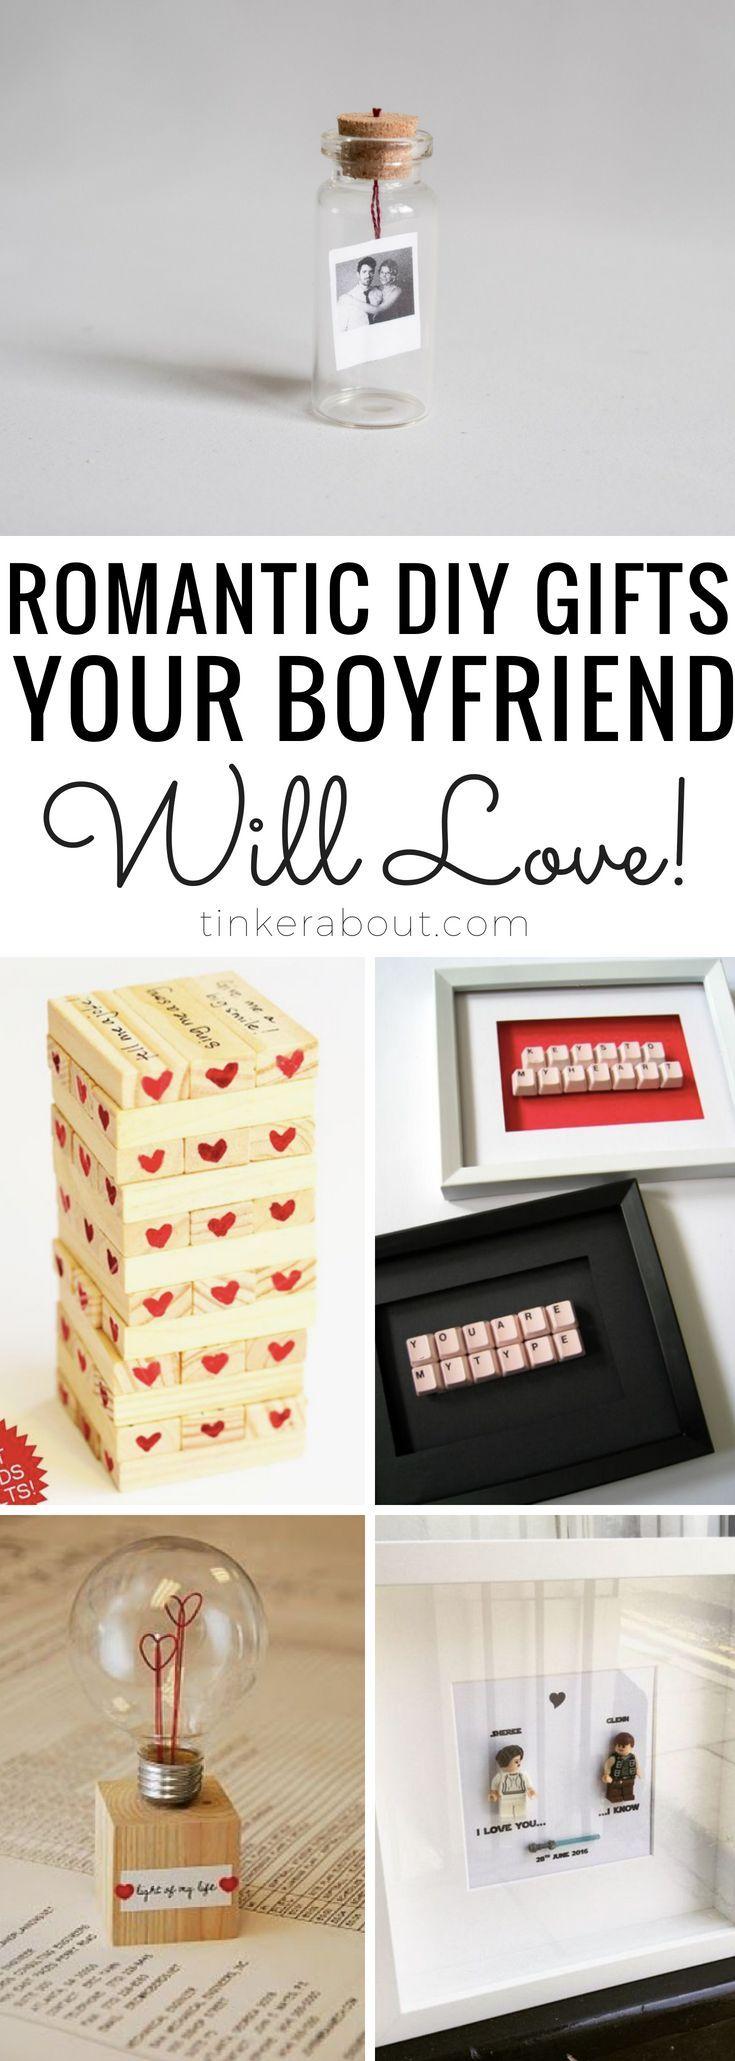 17 DIY Gifts For Boyfriends (Ideal For Anniversaries & Valentine\'s ...